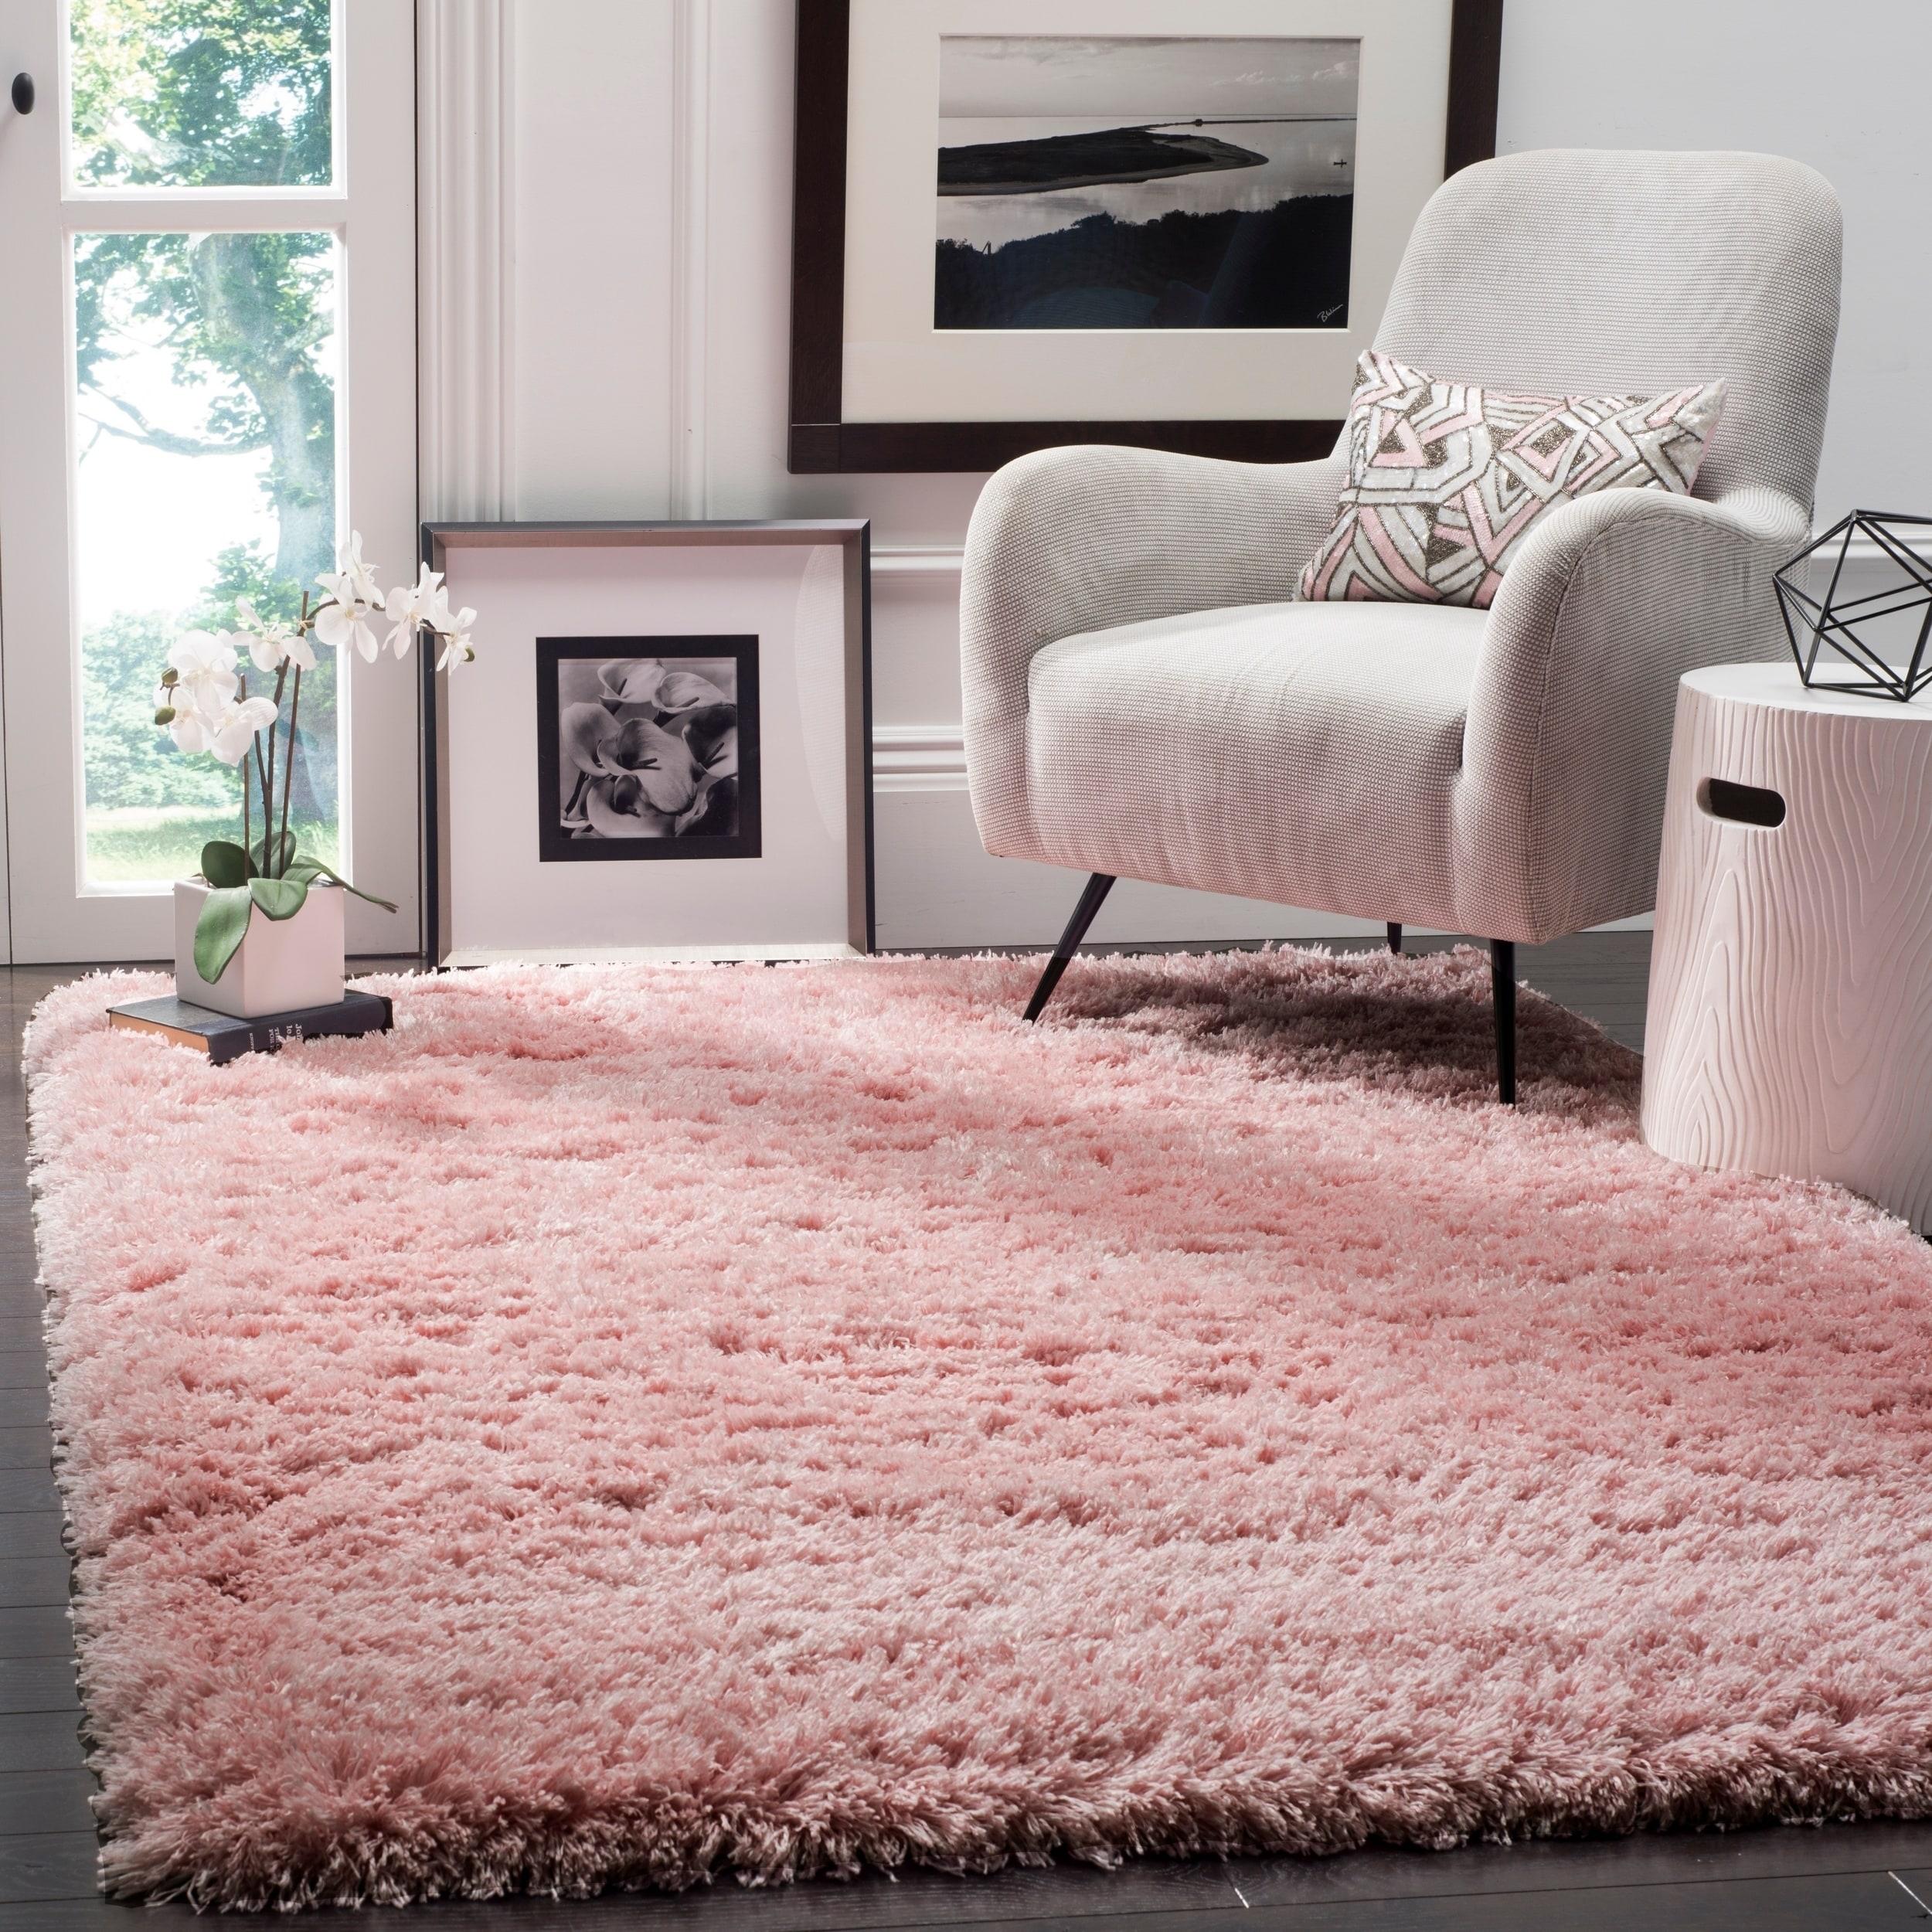 Shop Safavieh Polar Light Pink Shag Rug 8 X 10 On Sale Free